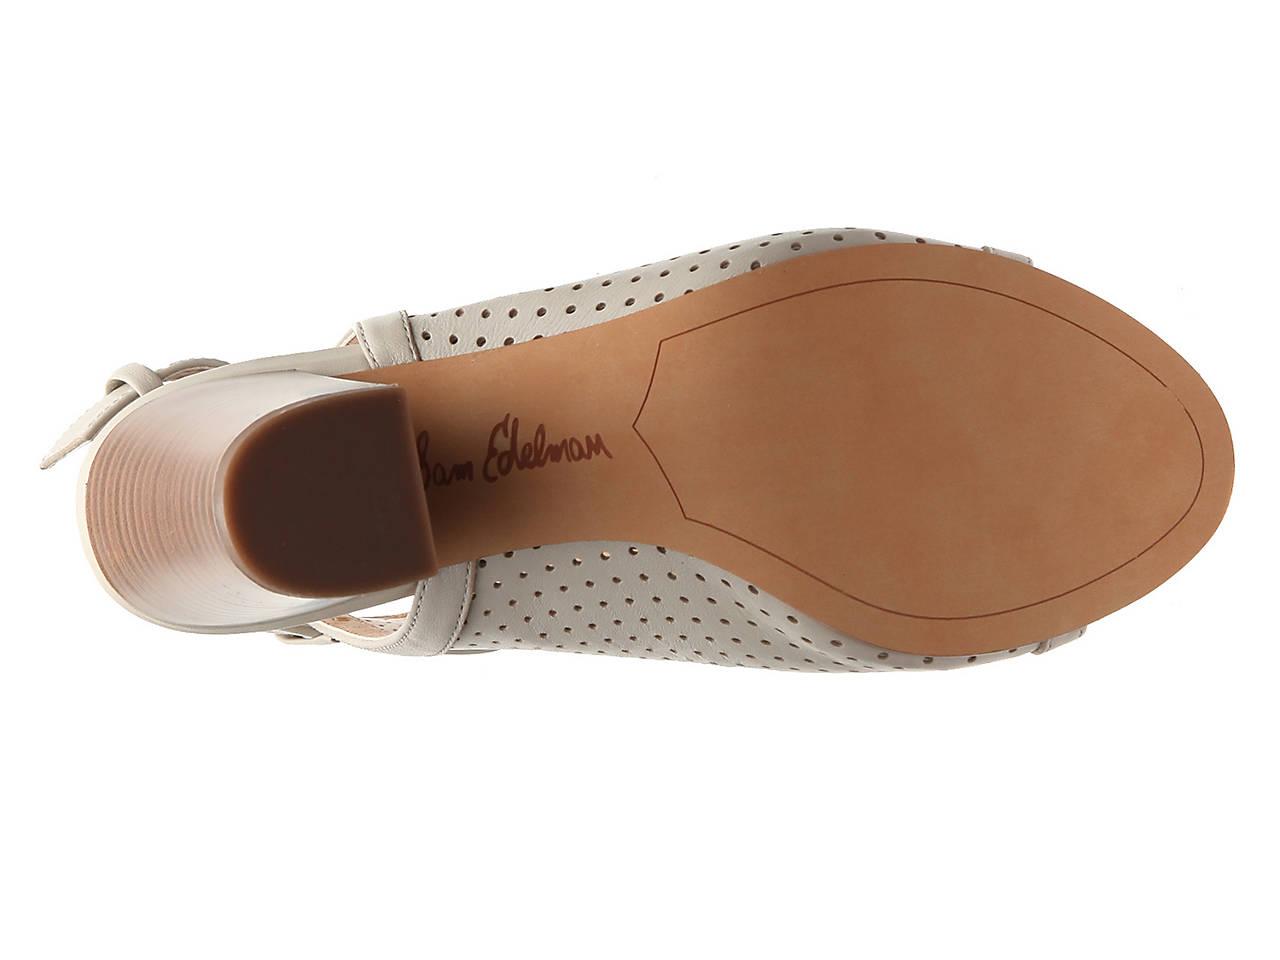 d0ca2b1cd Sam Edelman Emmie Sandal Women s Shoes